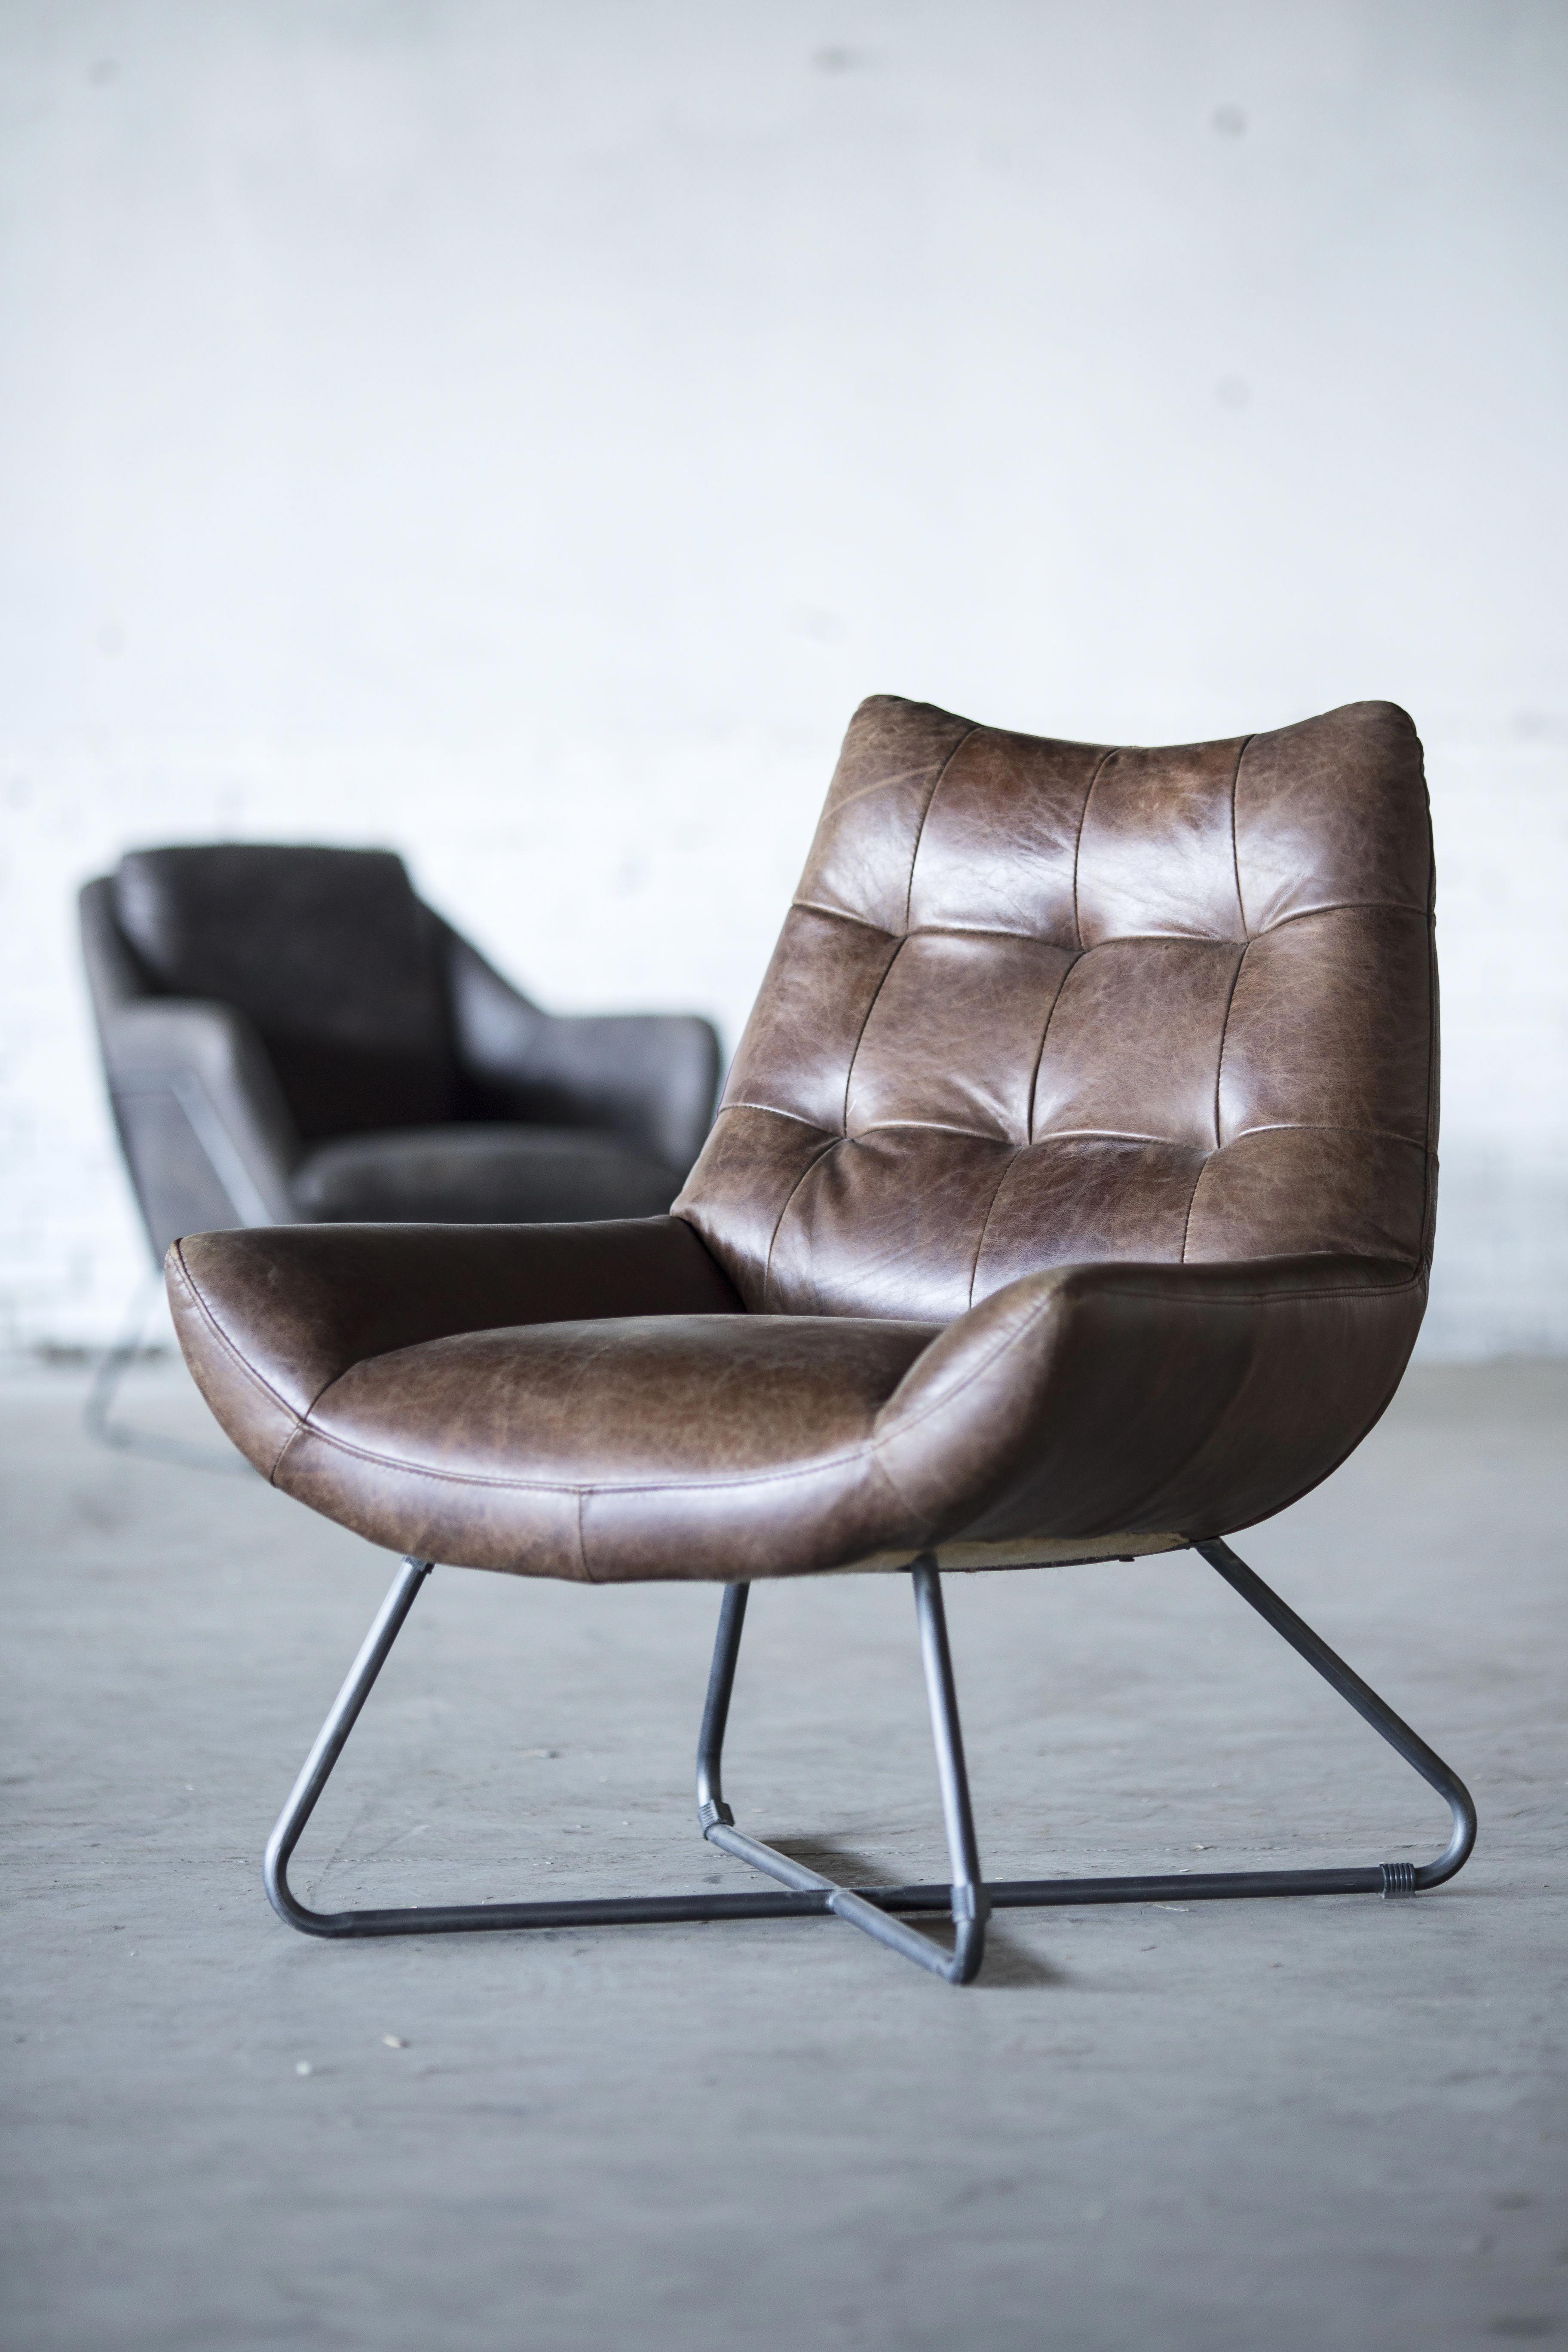 Chairs For Sale Restaurant Chairsforsmallspaces Design Escandinavo Poltrona Quartos